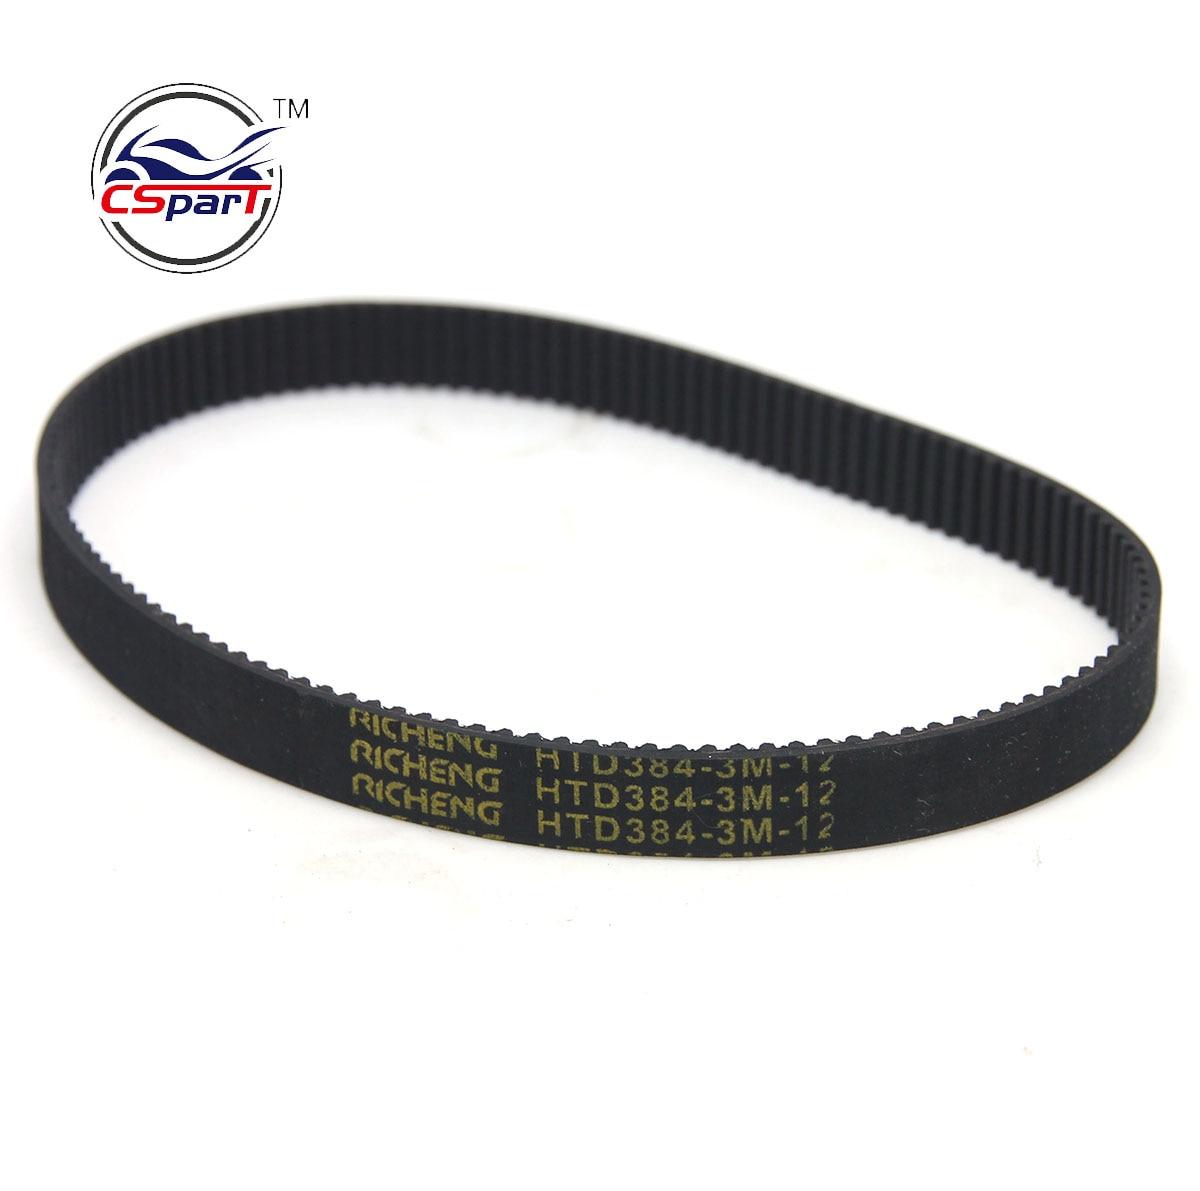 Electric Scooter Rubber Transmission Belt 3m-384-12 Timing Drive Belt Practical